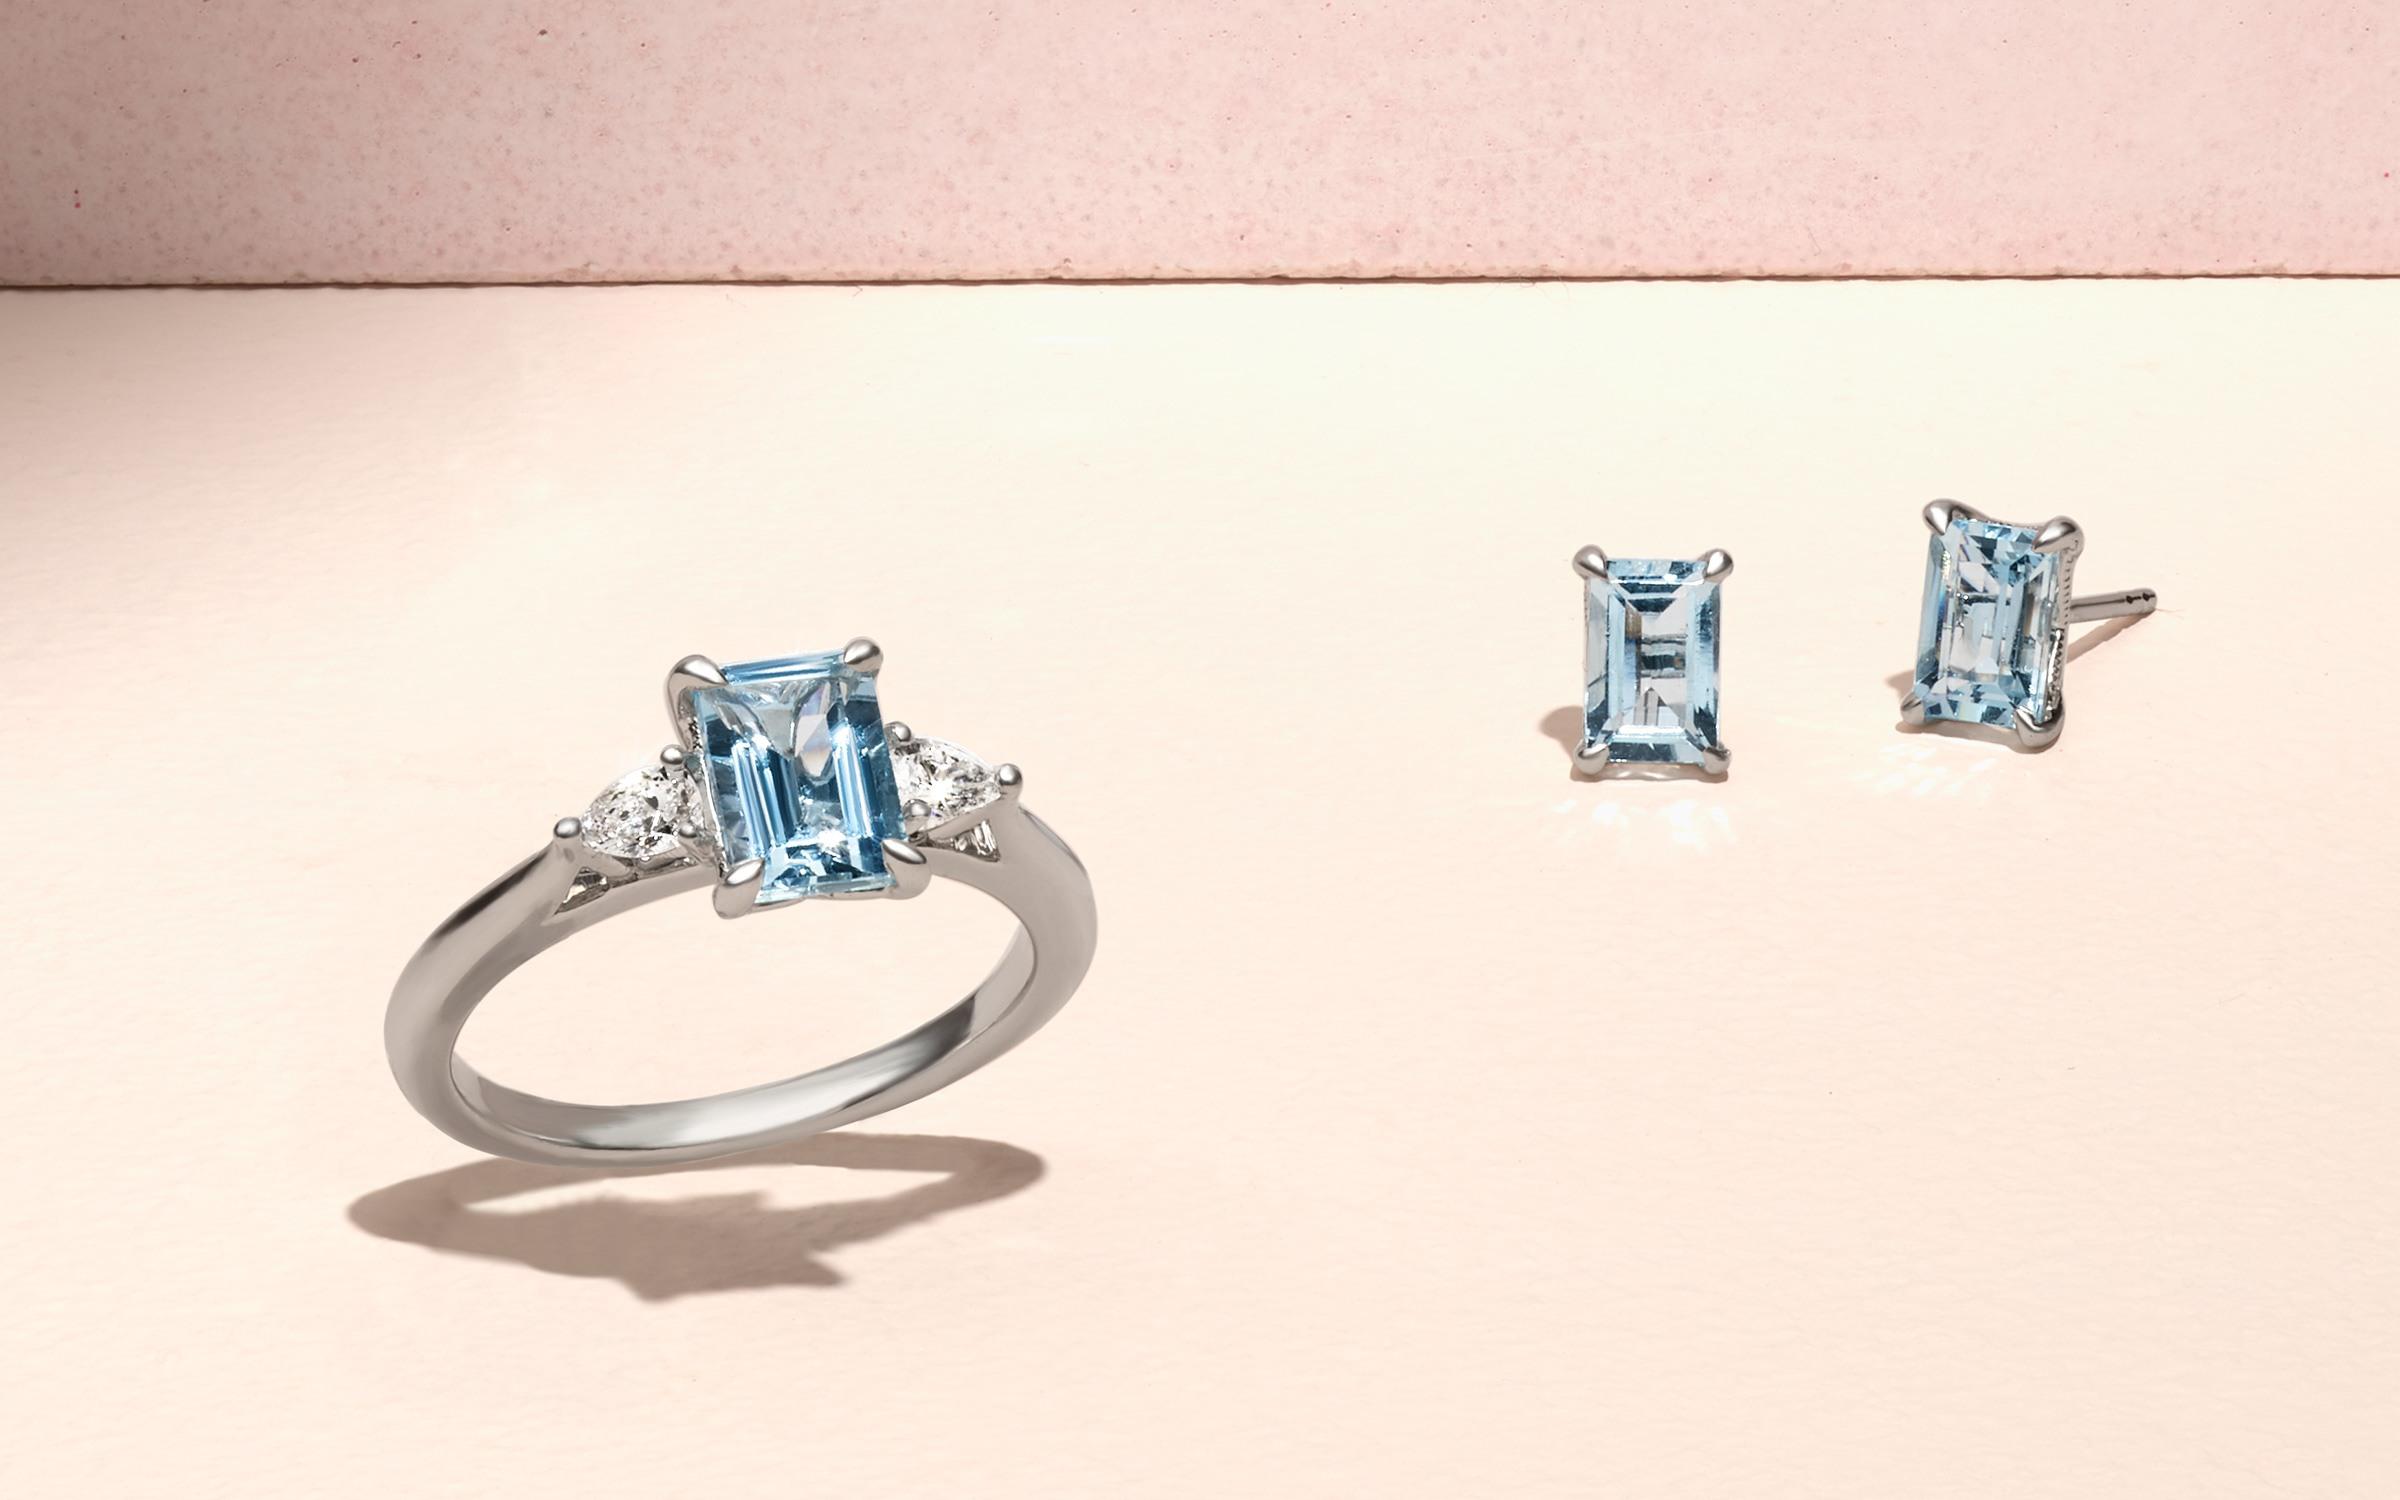 Aquamarine and Diamond Ring and Emerald-Cut Aquamarine Studs.